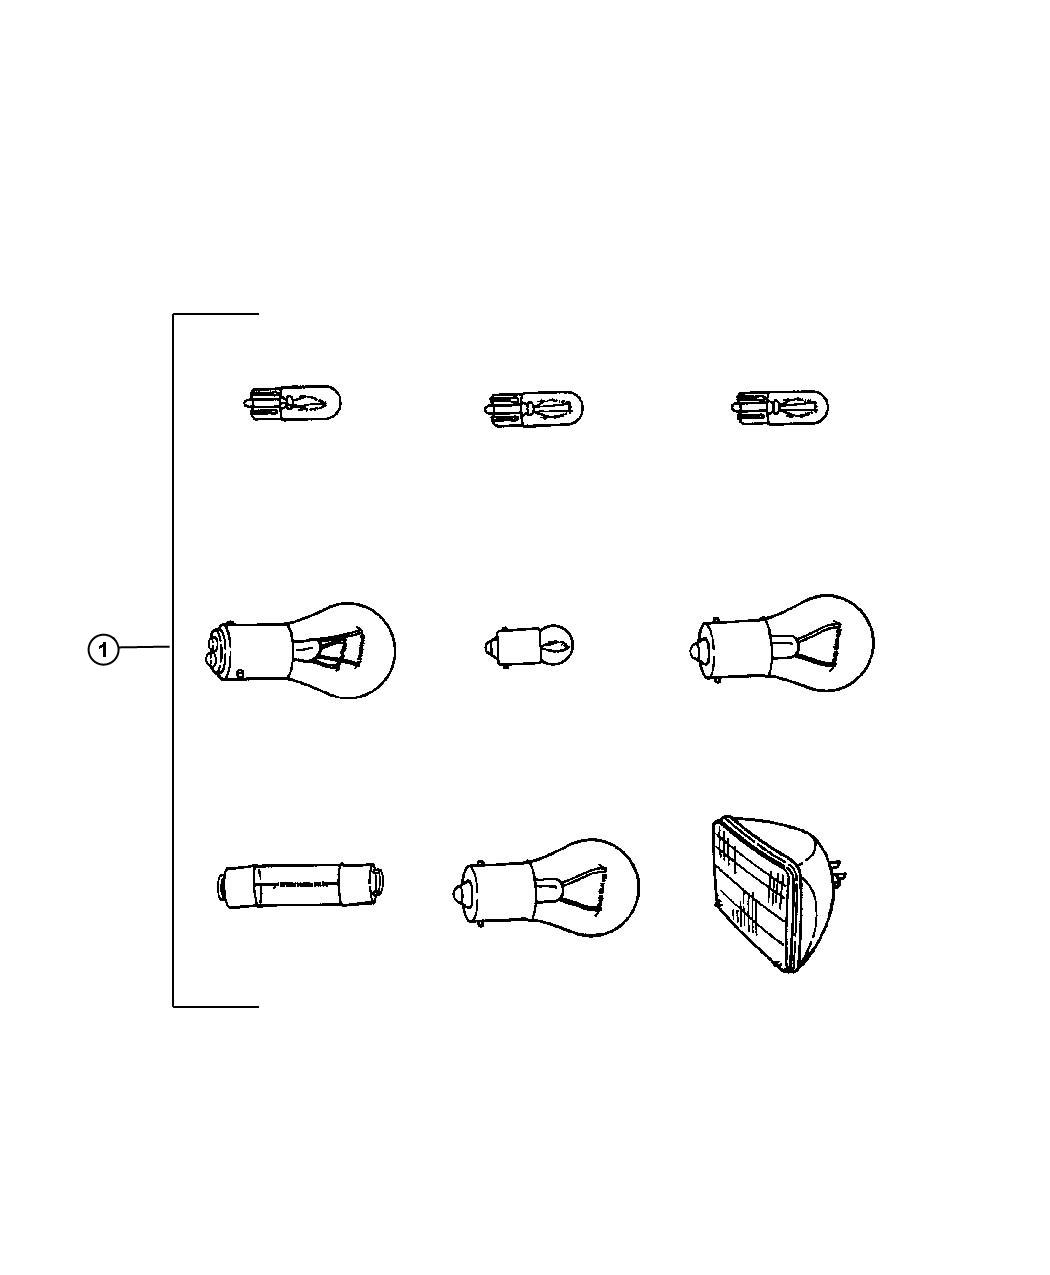 Jeep Liberty Bulb 161 Ash Receiver Ash Receiver Lamp